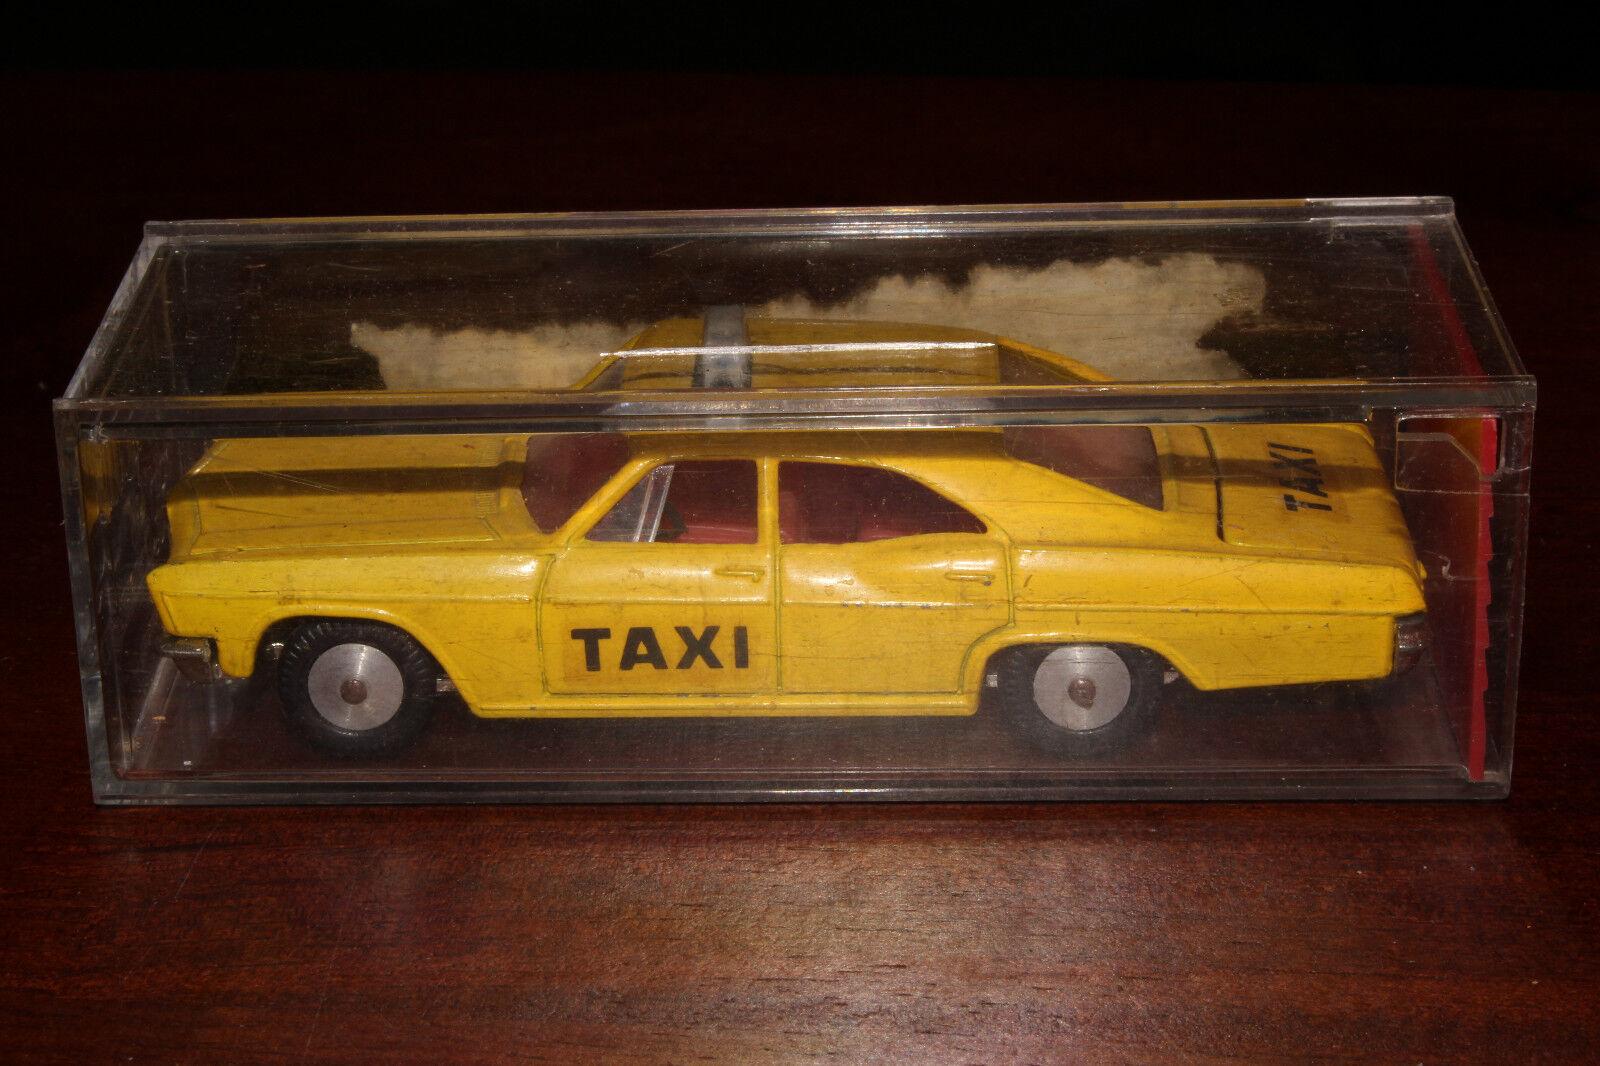 Sabra , Cragstan Metal Fundido, 1965 Chevrolet Impala Taxi, Caja Original